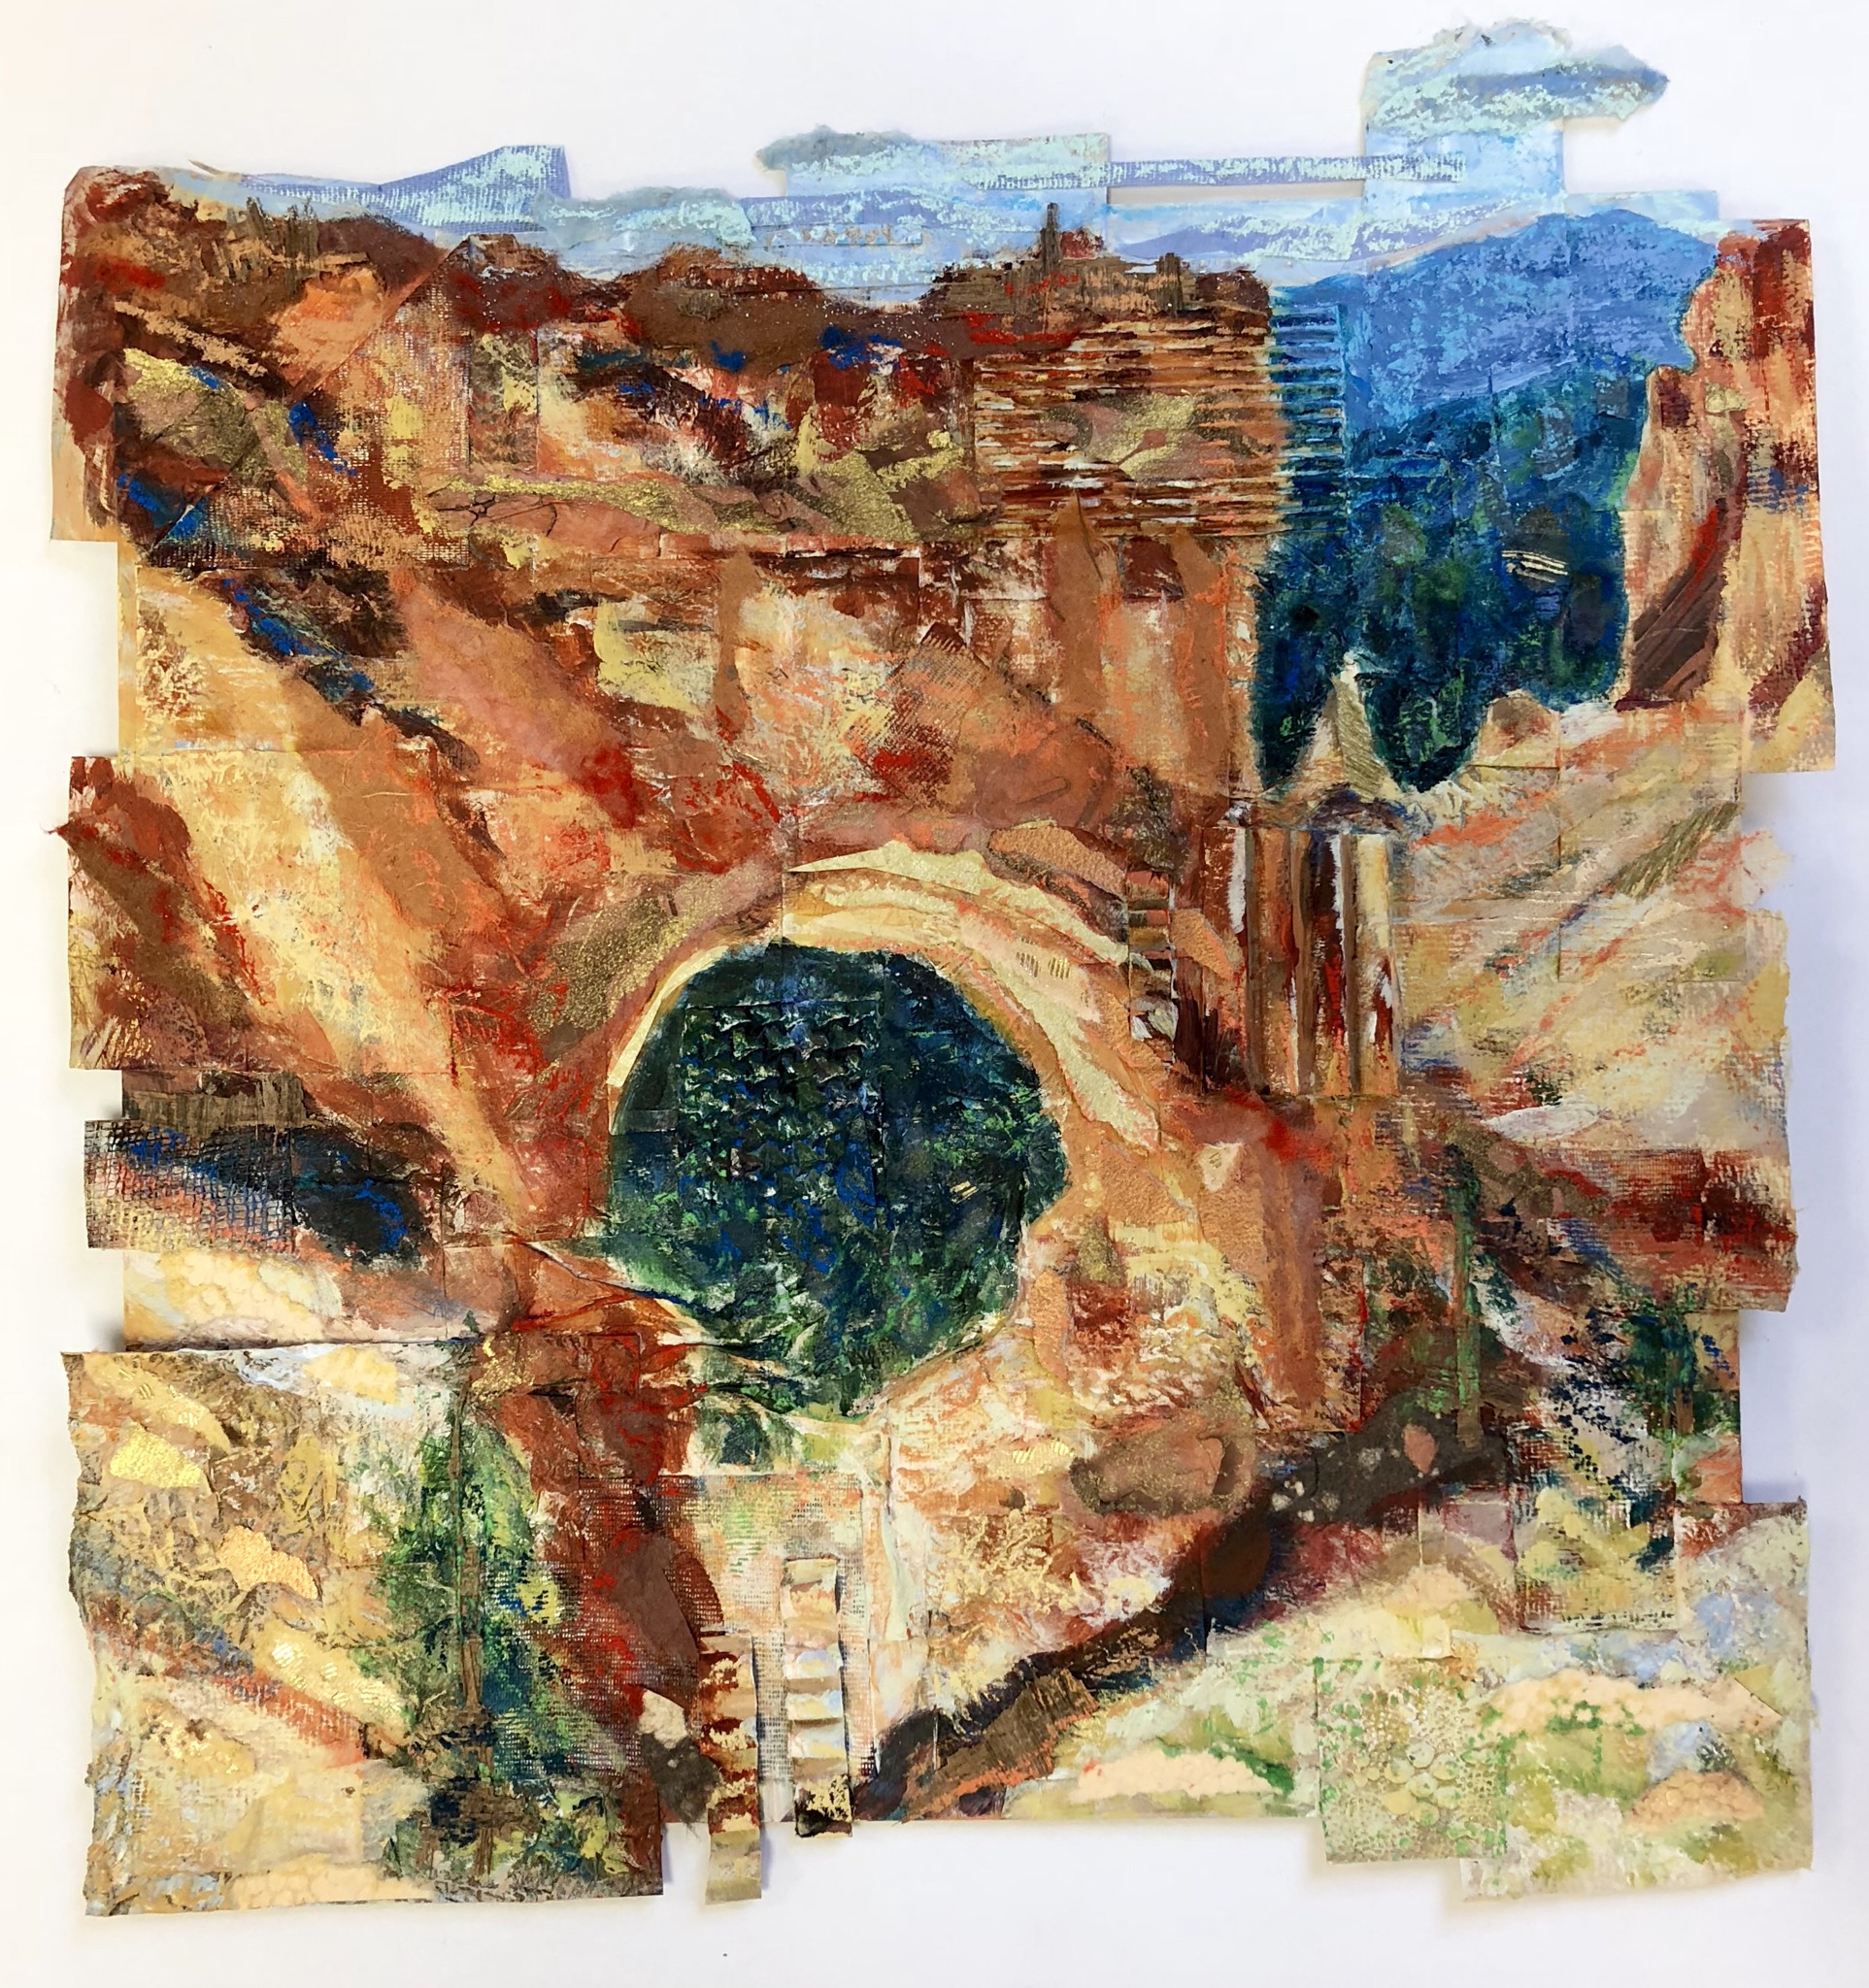 Natural Bridge - Bryce Canyon National Park, UT